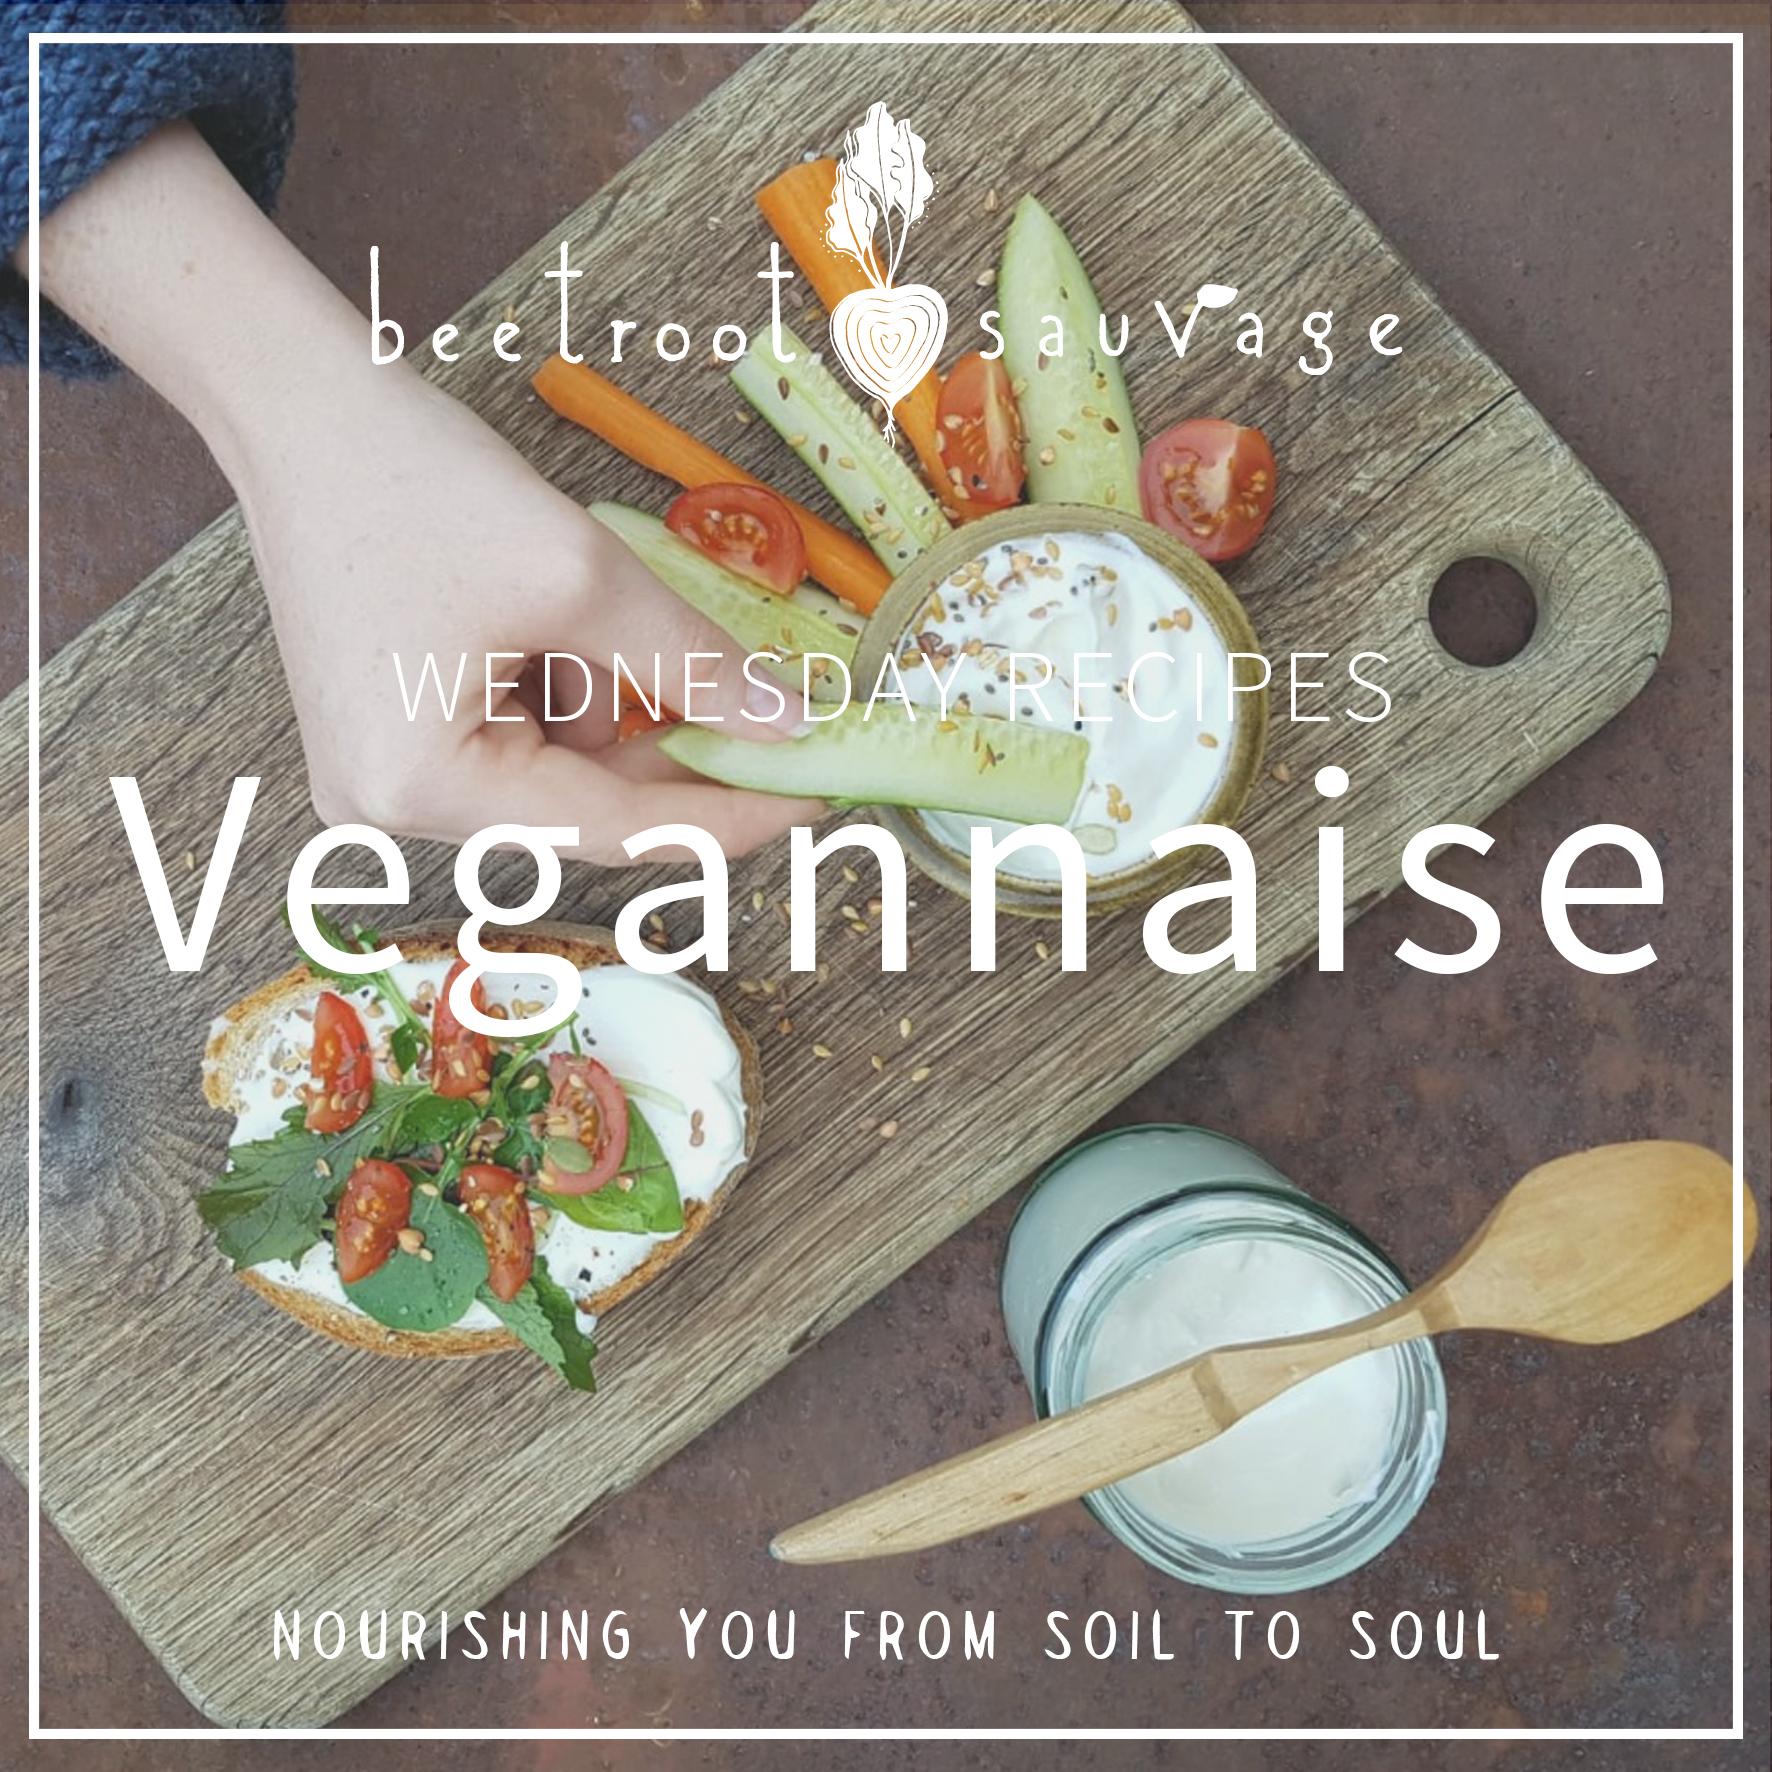 WR_veganaise2.jpg